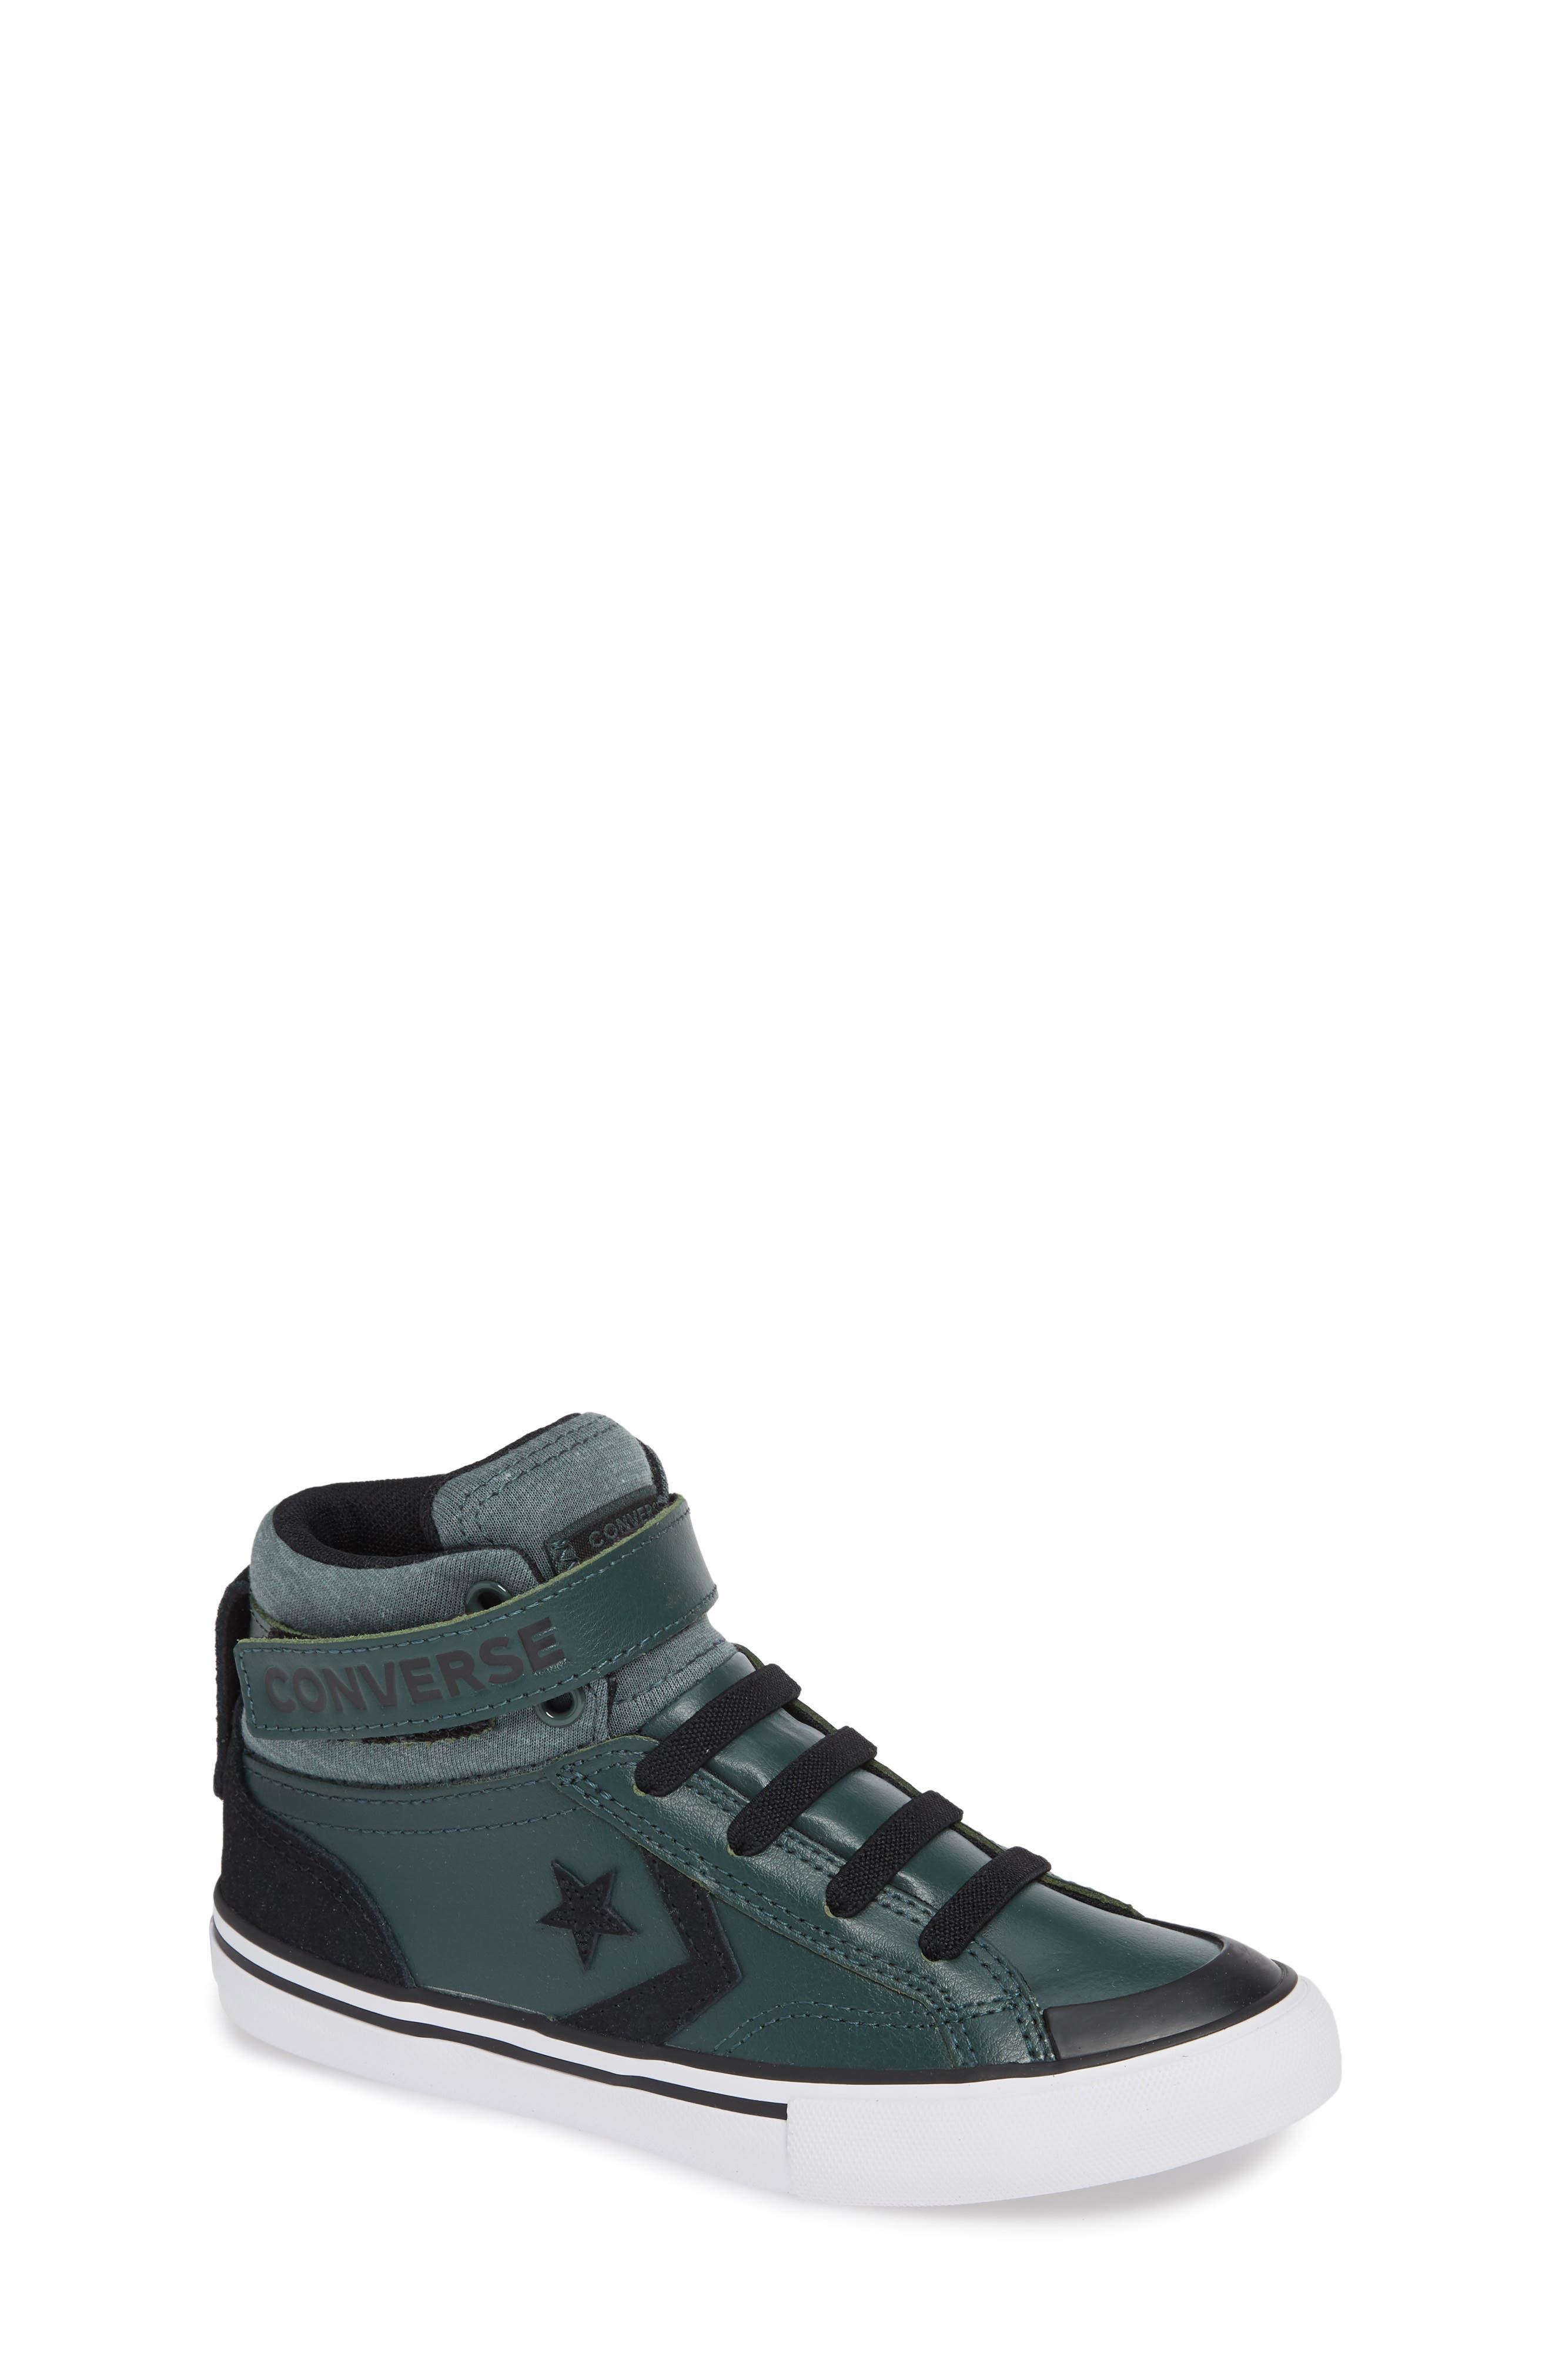 Pro Blaze High Top Sneaker,                             Main thumbnail 1, color,                             VINTAGE GREEN